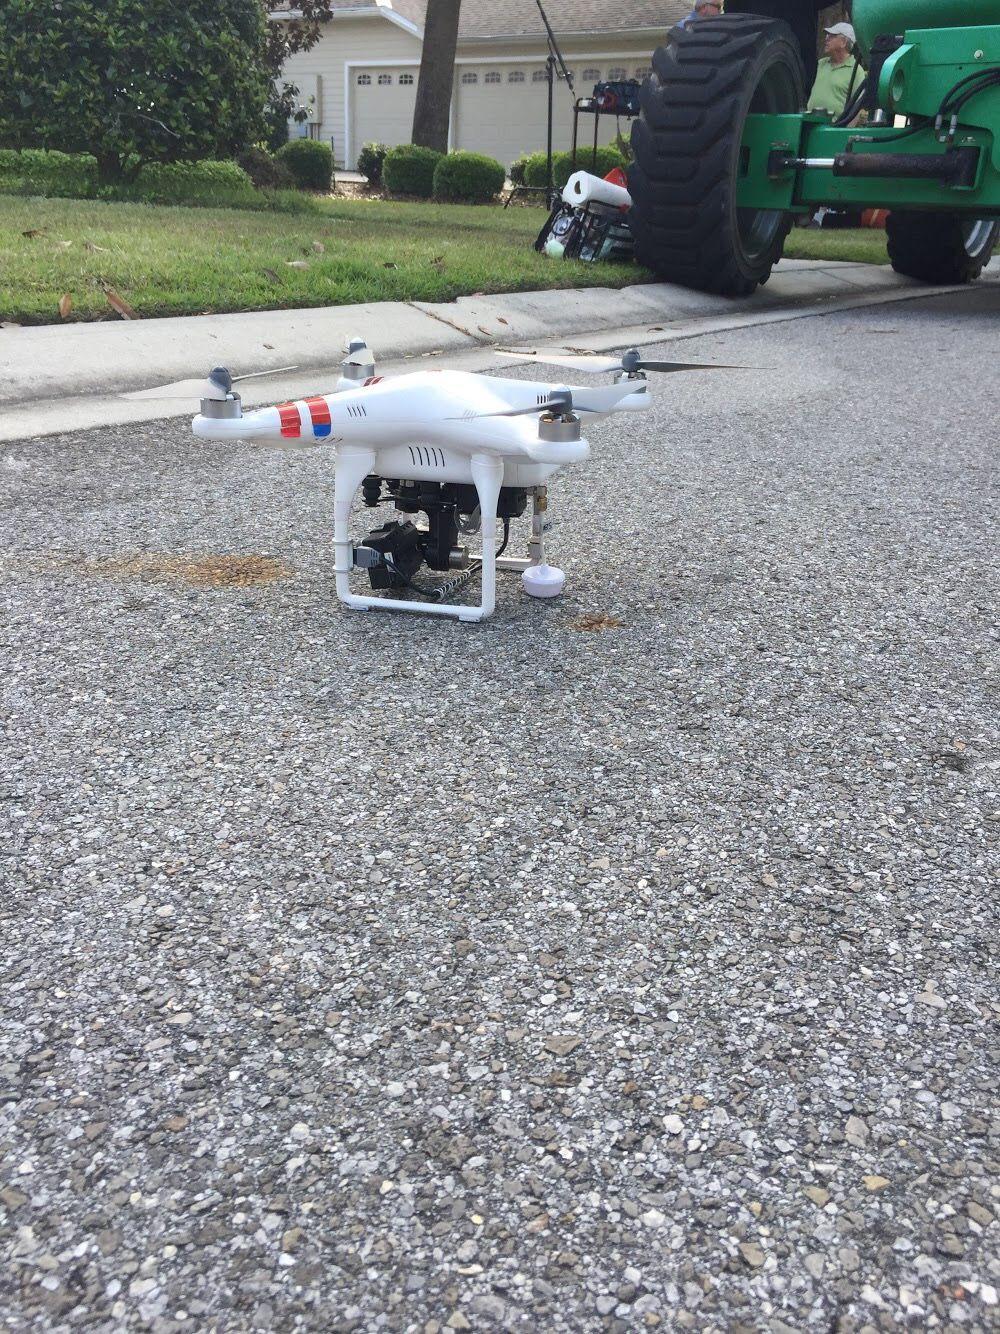 Pin by AdvantEdge Roofing on AdvantEdge Favorites Drone